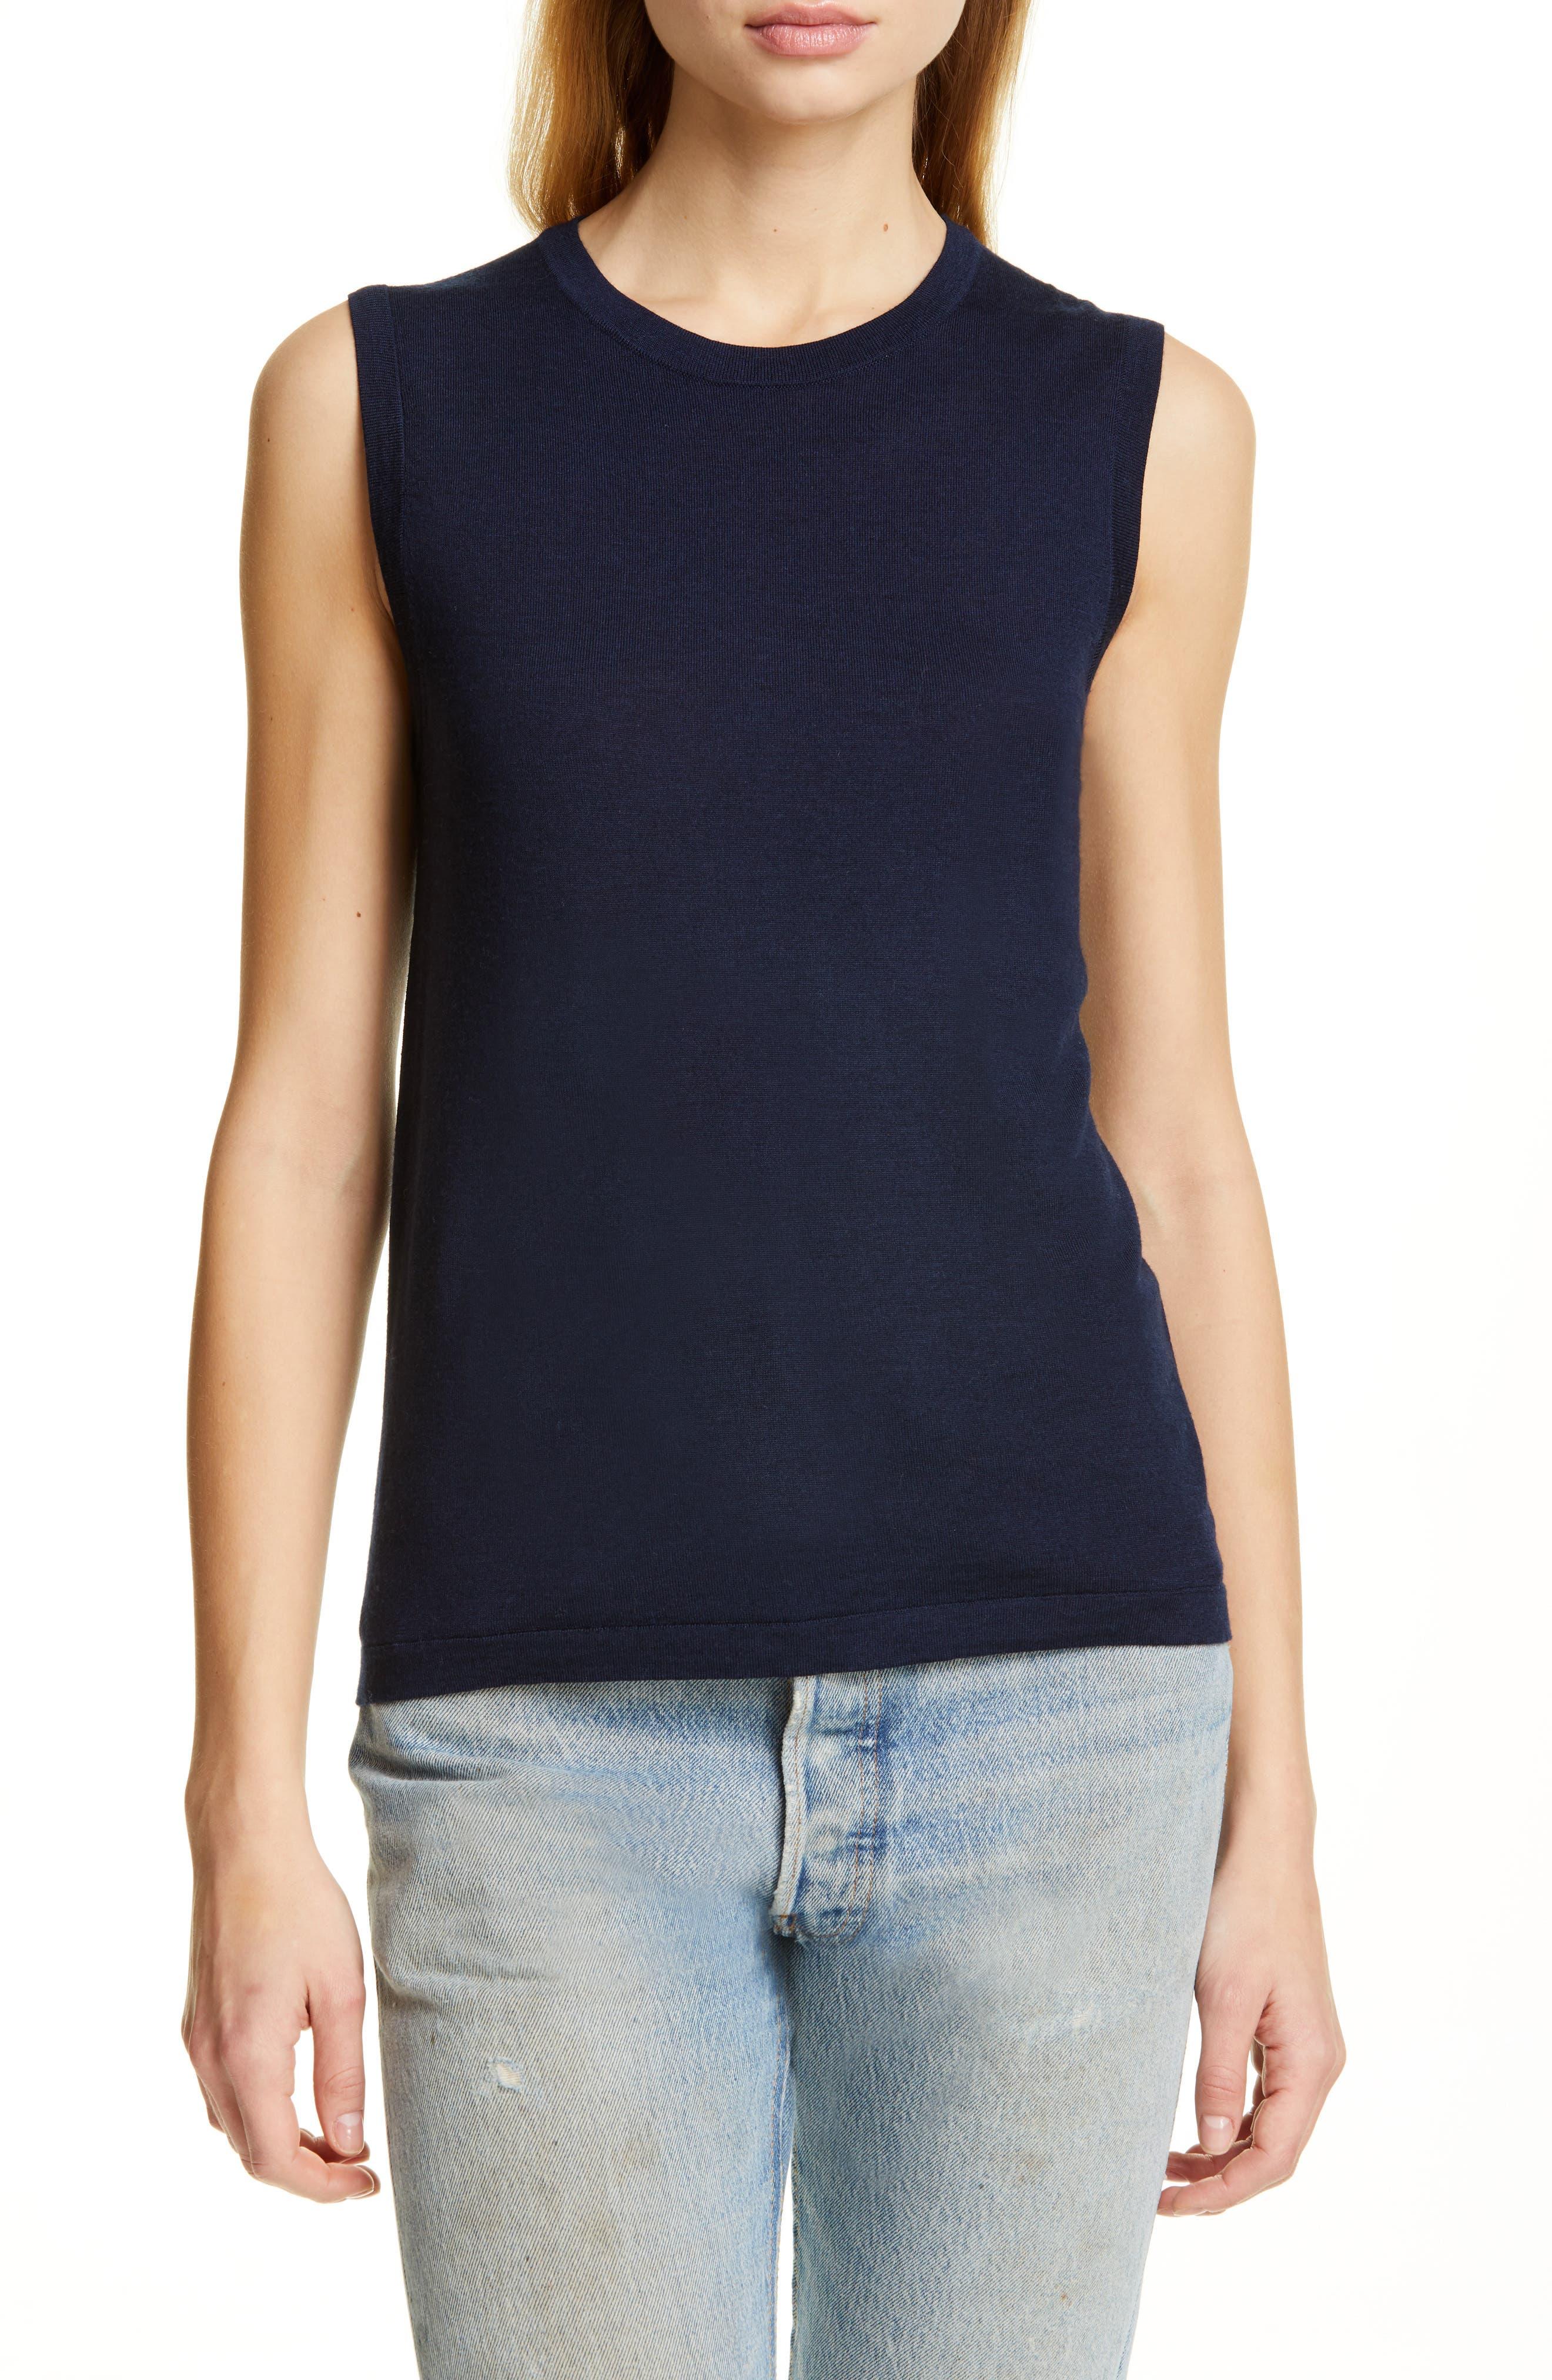 Jenni Kayne Merino Wool Sleeveless Sweater, Blue